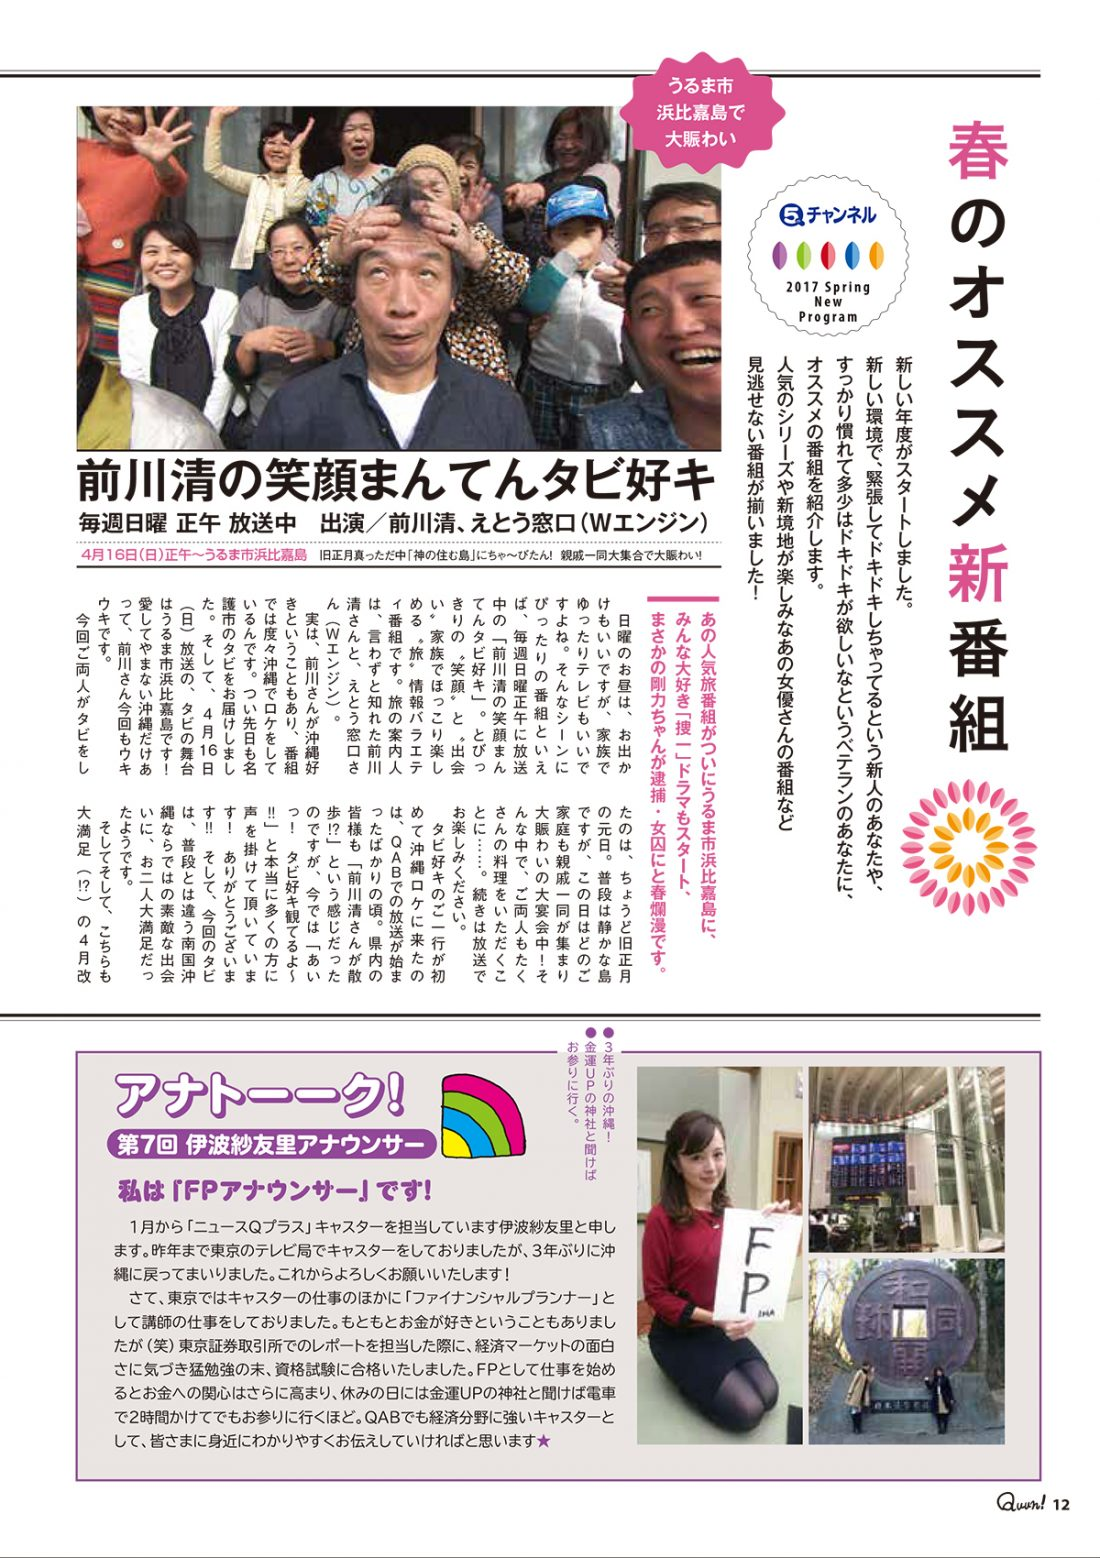 http://www.qab.co.jp/qgoro/wp-content/uploads/quun_0714-1100x1558.jpg